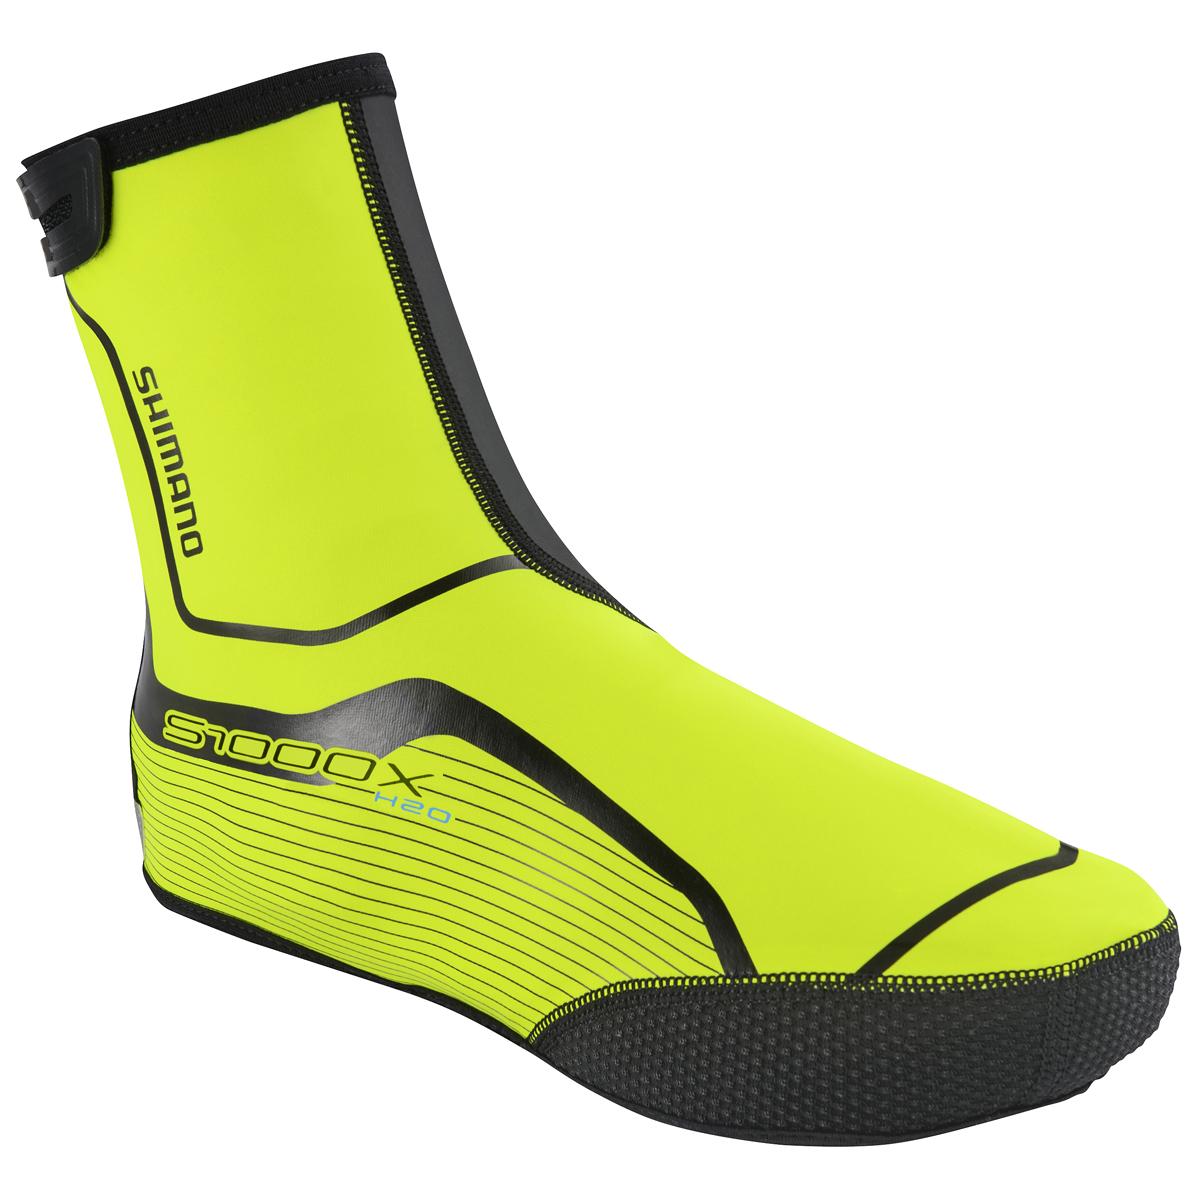 Shimano Ochraniacze S1000X H2O Neon żółte M